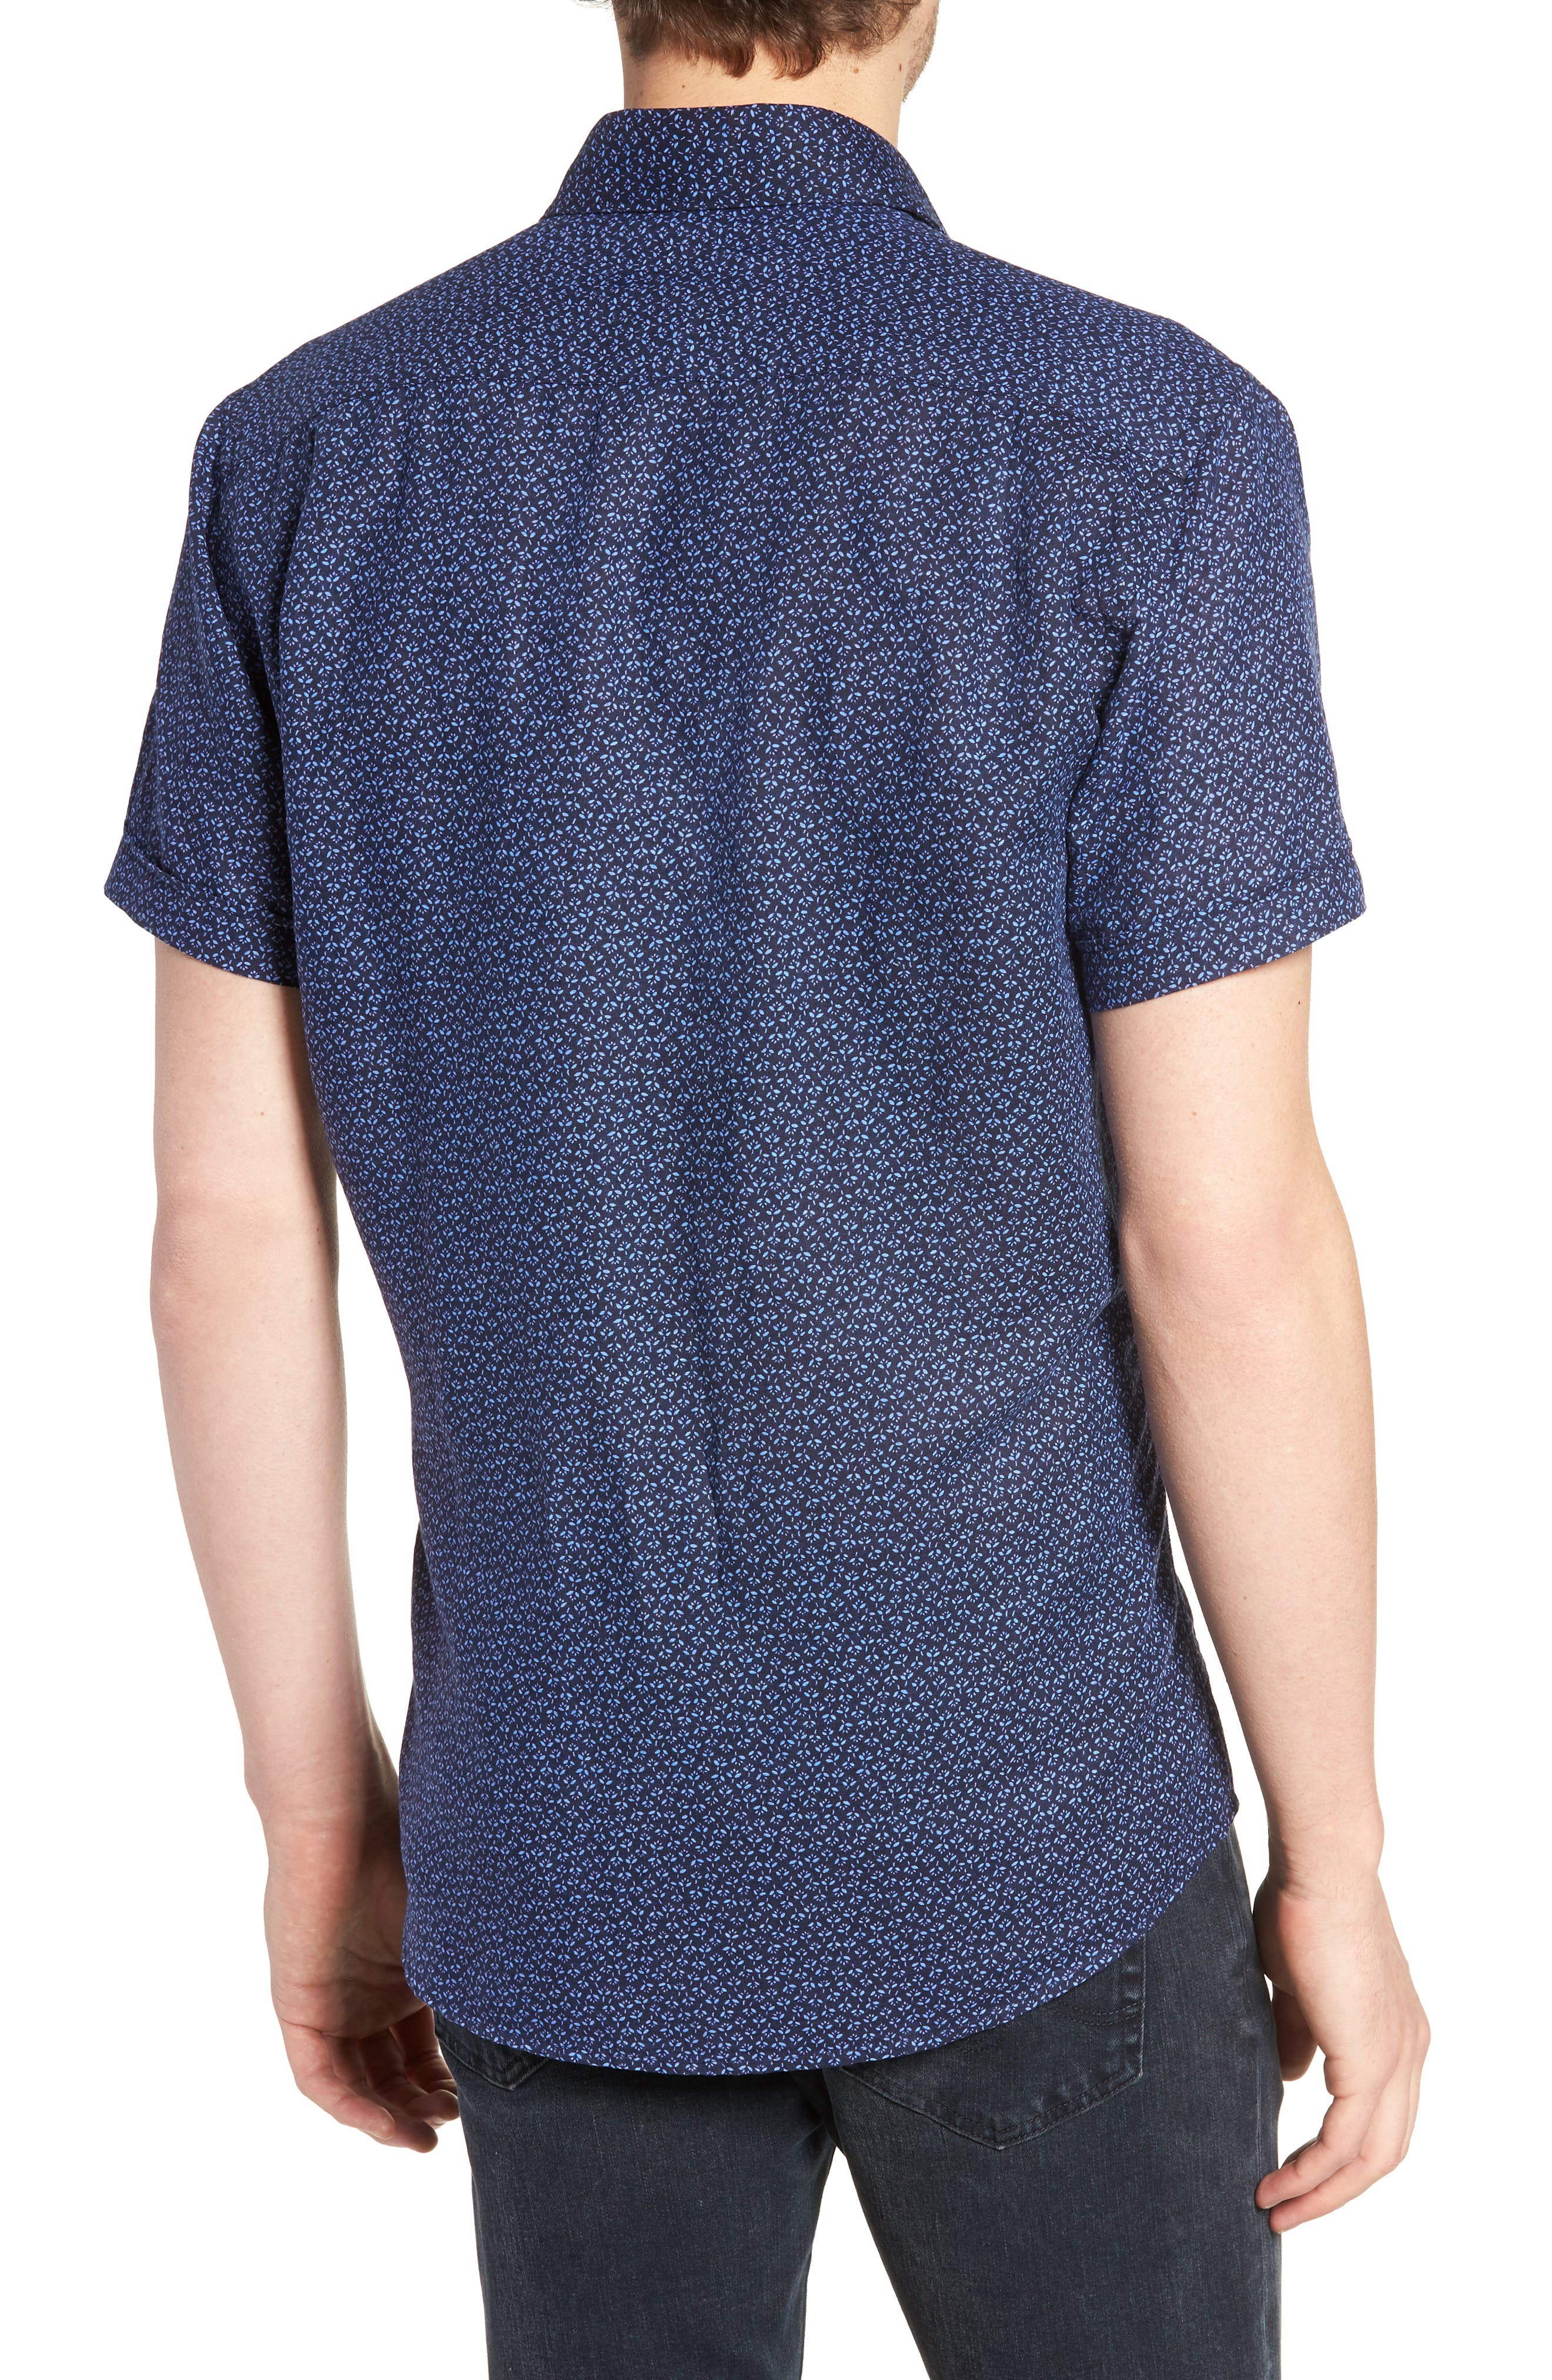 Windermere Linen & Cotton Sport Shirt,                             Alternate thumbnail 2, color,                             INDIGO